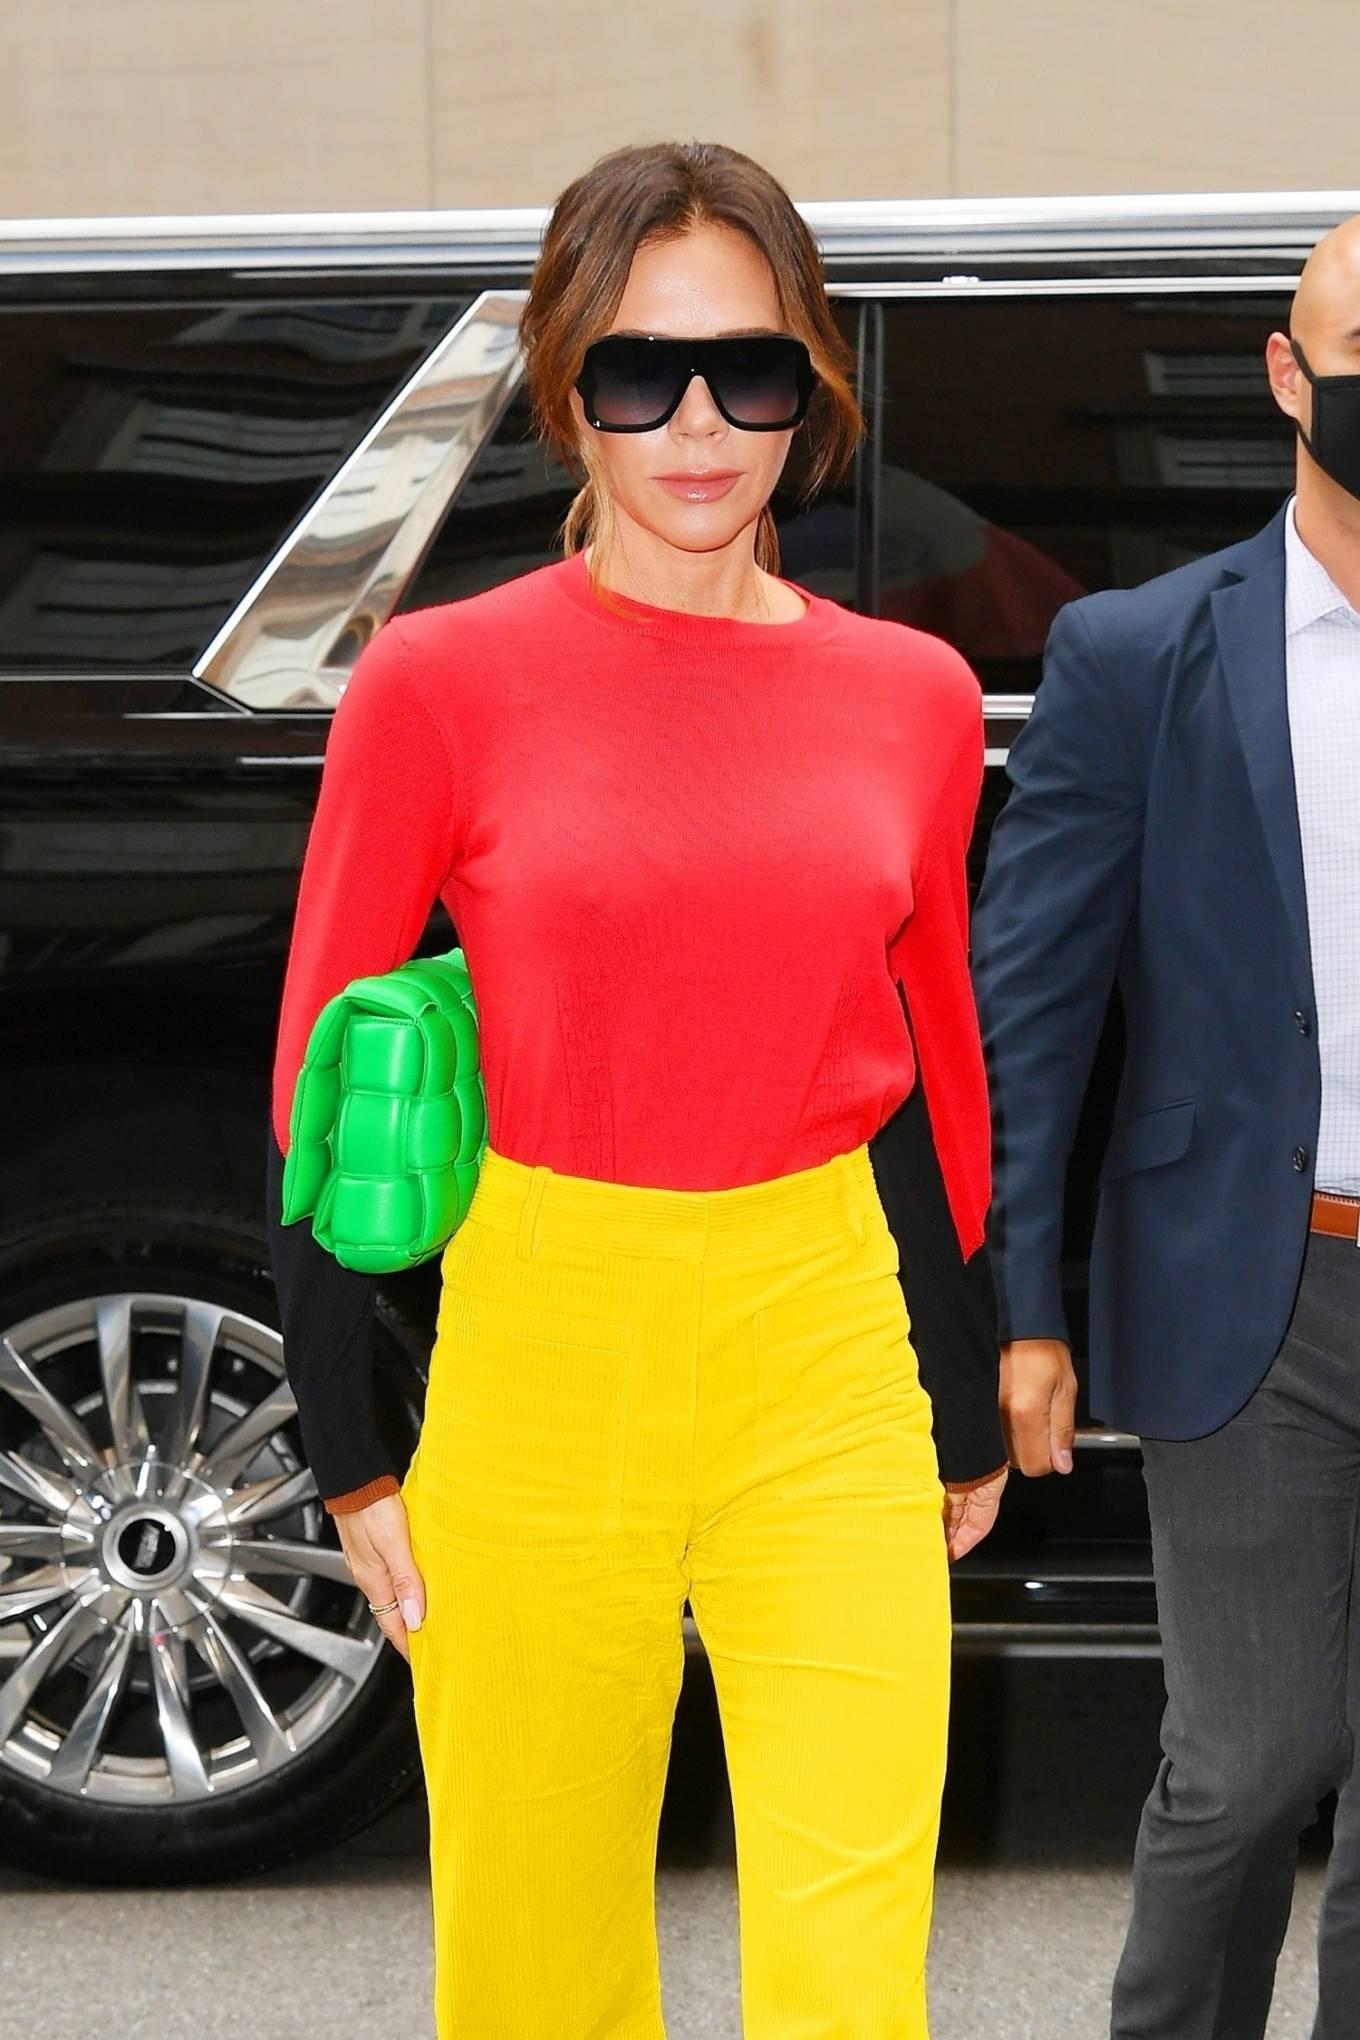 Victoria Beckham 2021 : Victoria Beckham – on Good Morning America promoting her new designer clothing in New York City-29